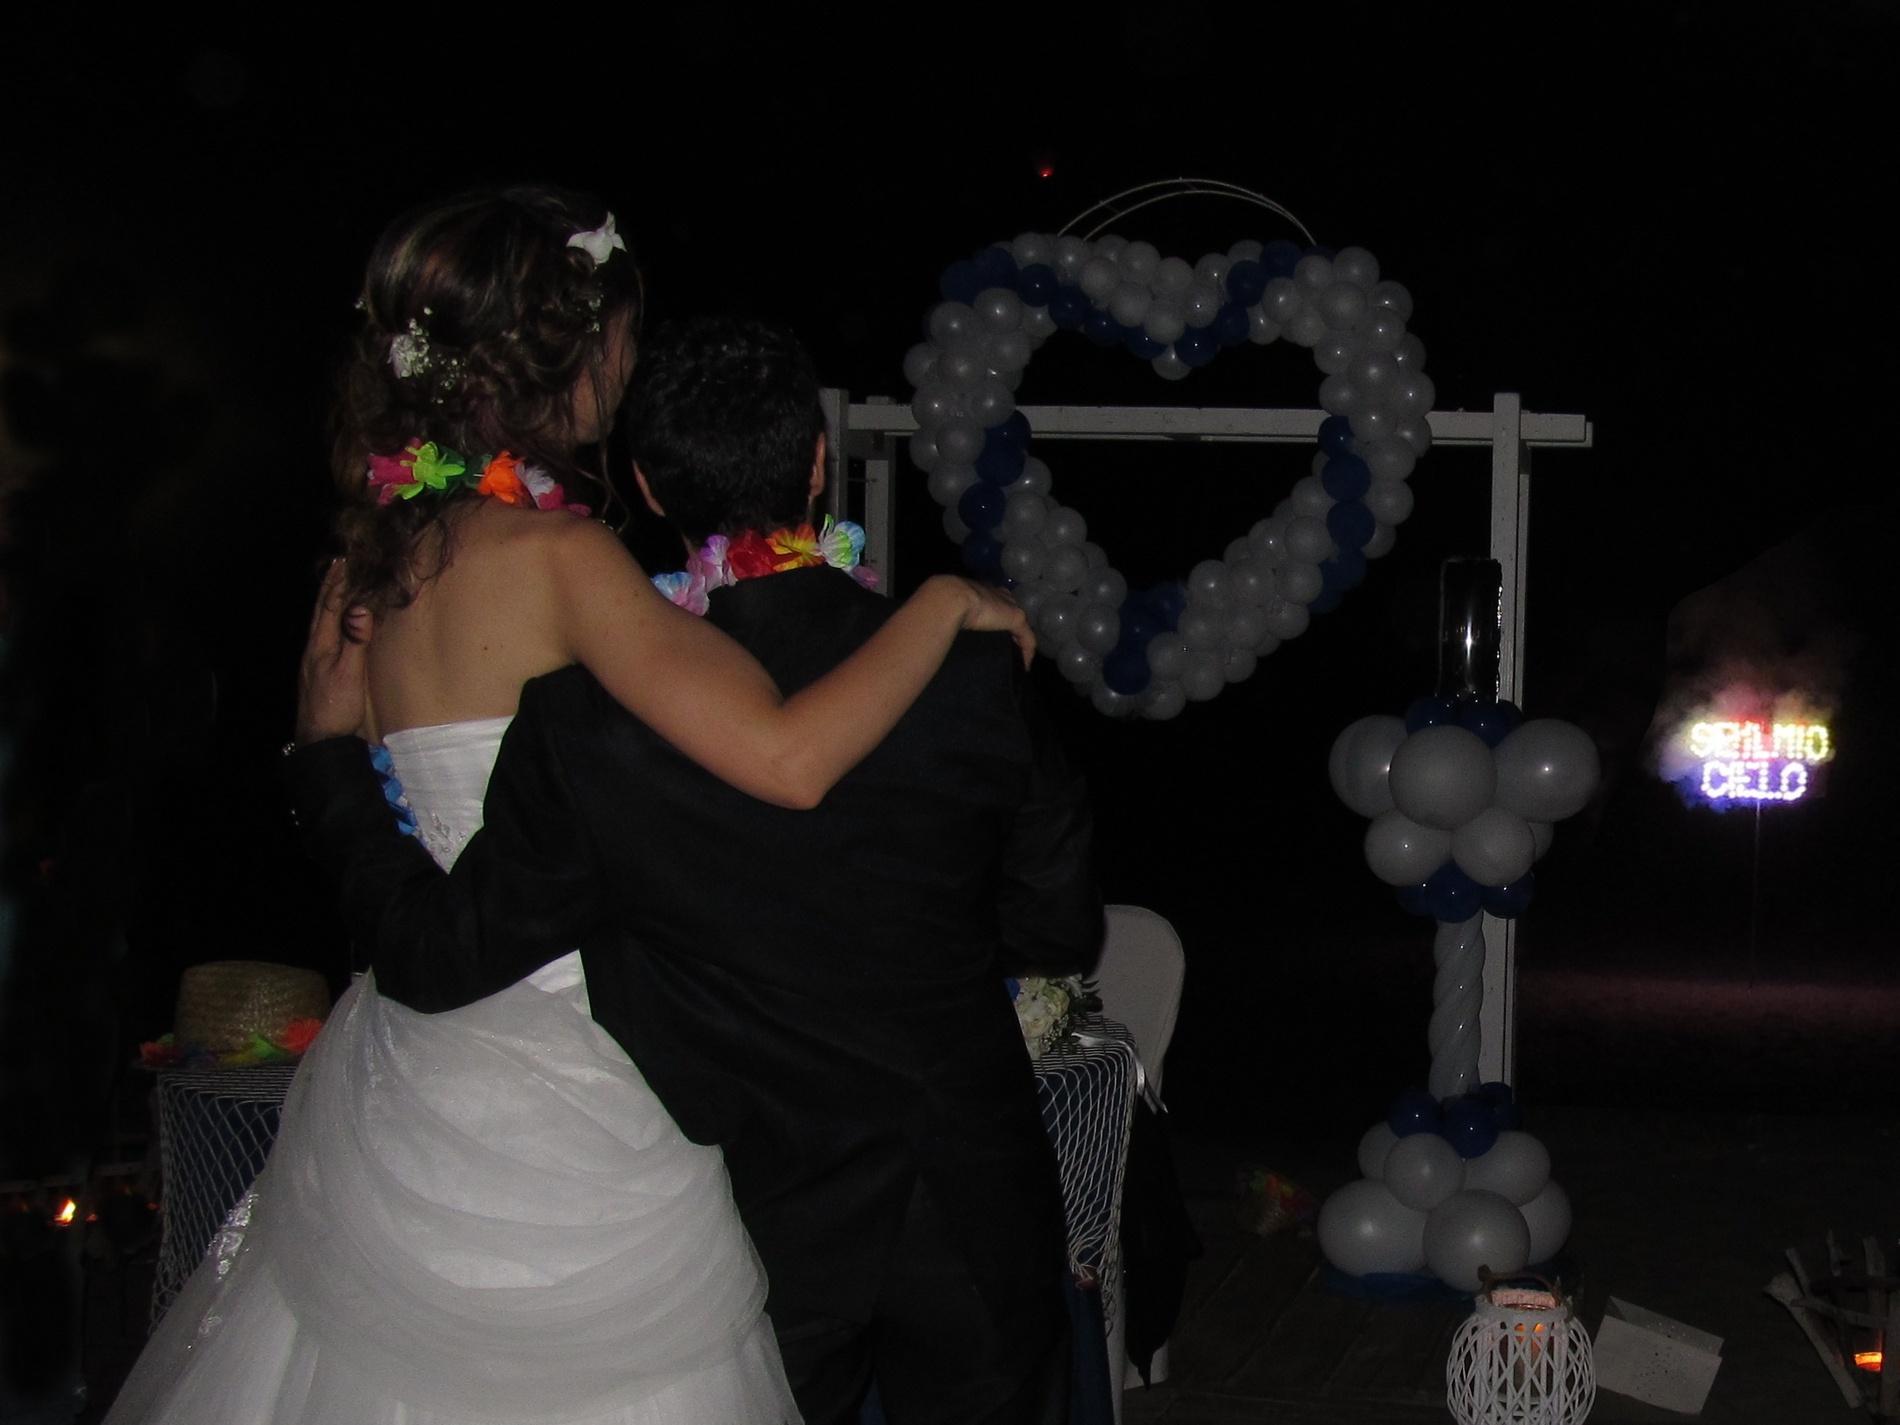 matrimonio-ilaria-torrisi-e-marco-di-lucia-2015-08-08-22-51-47